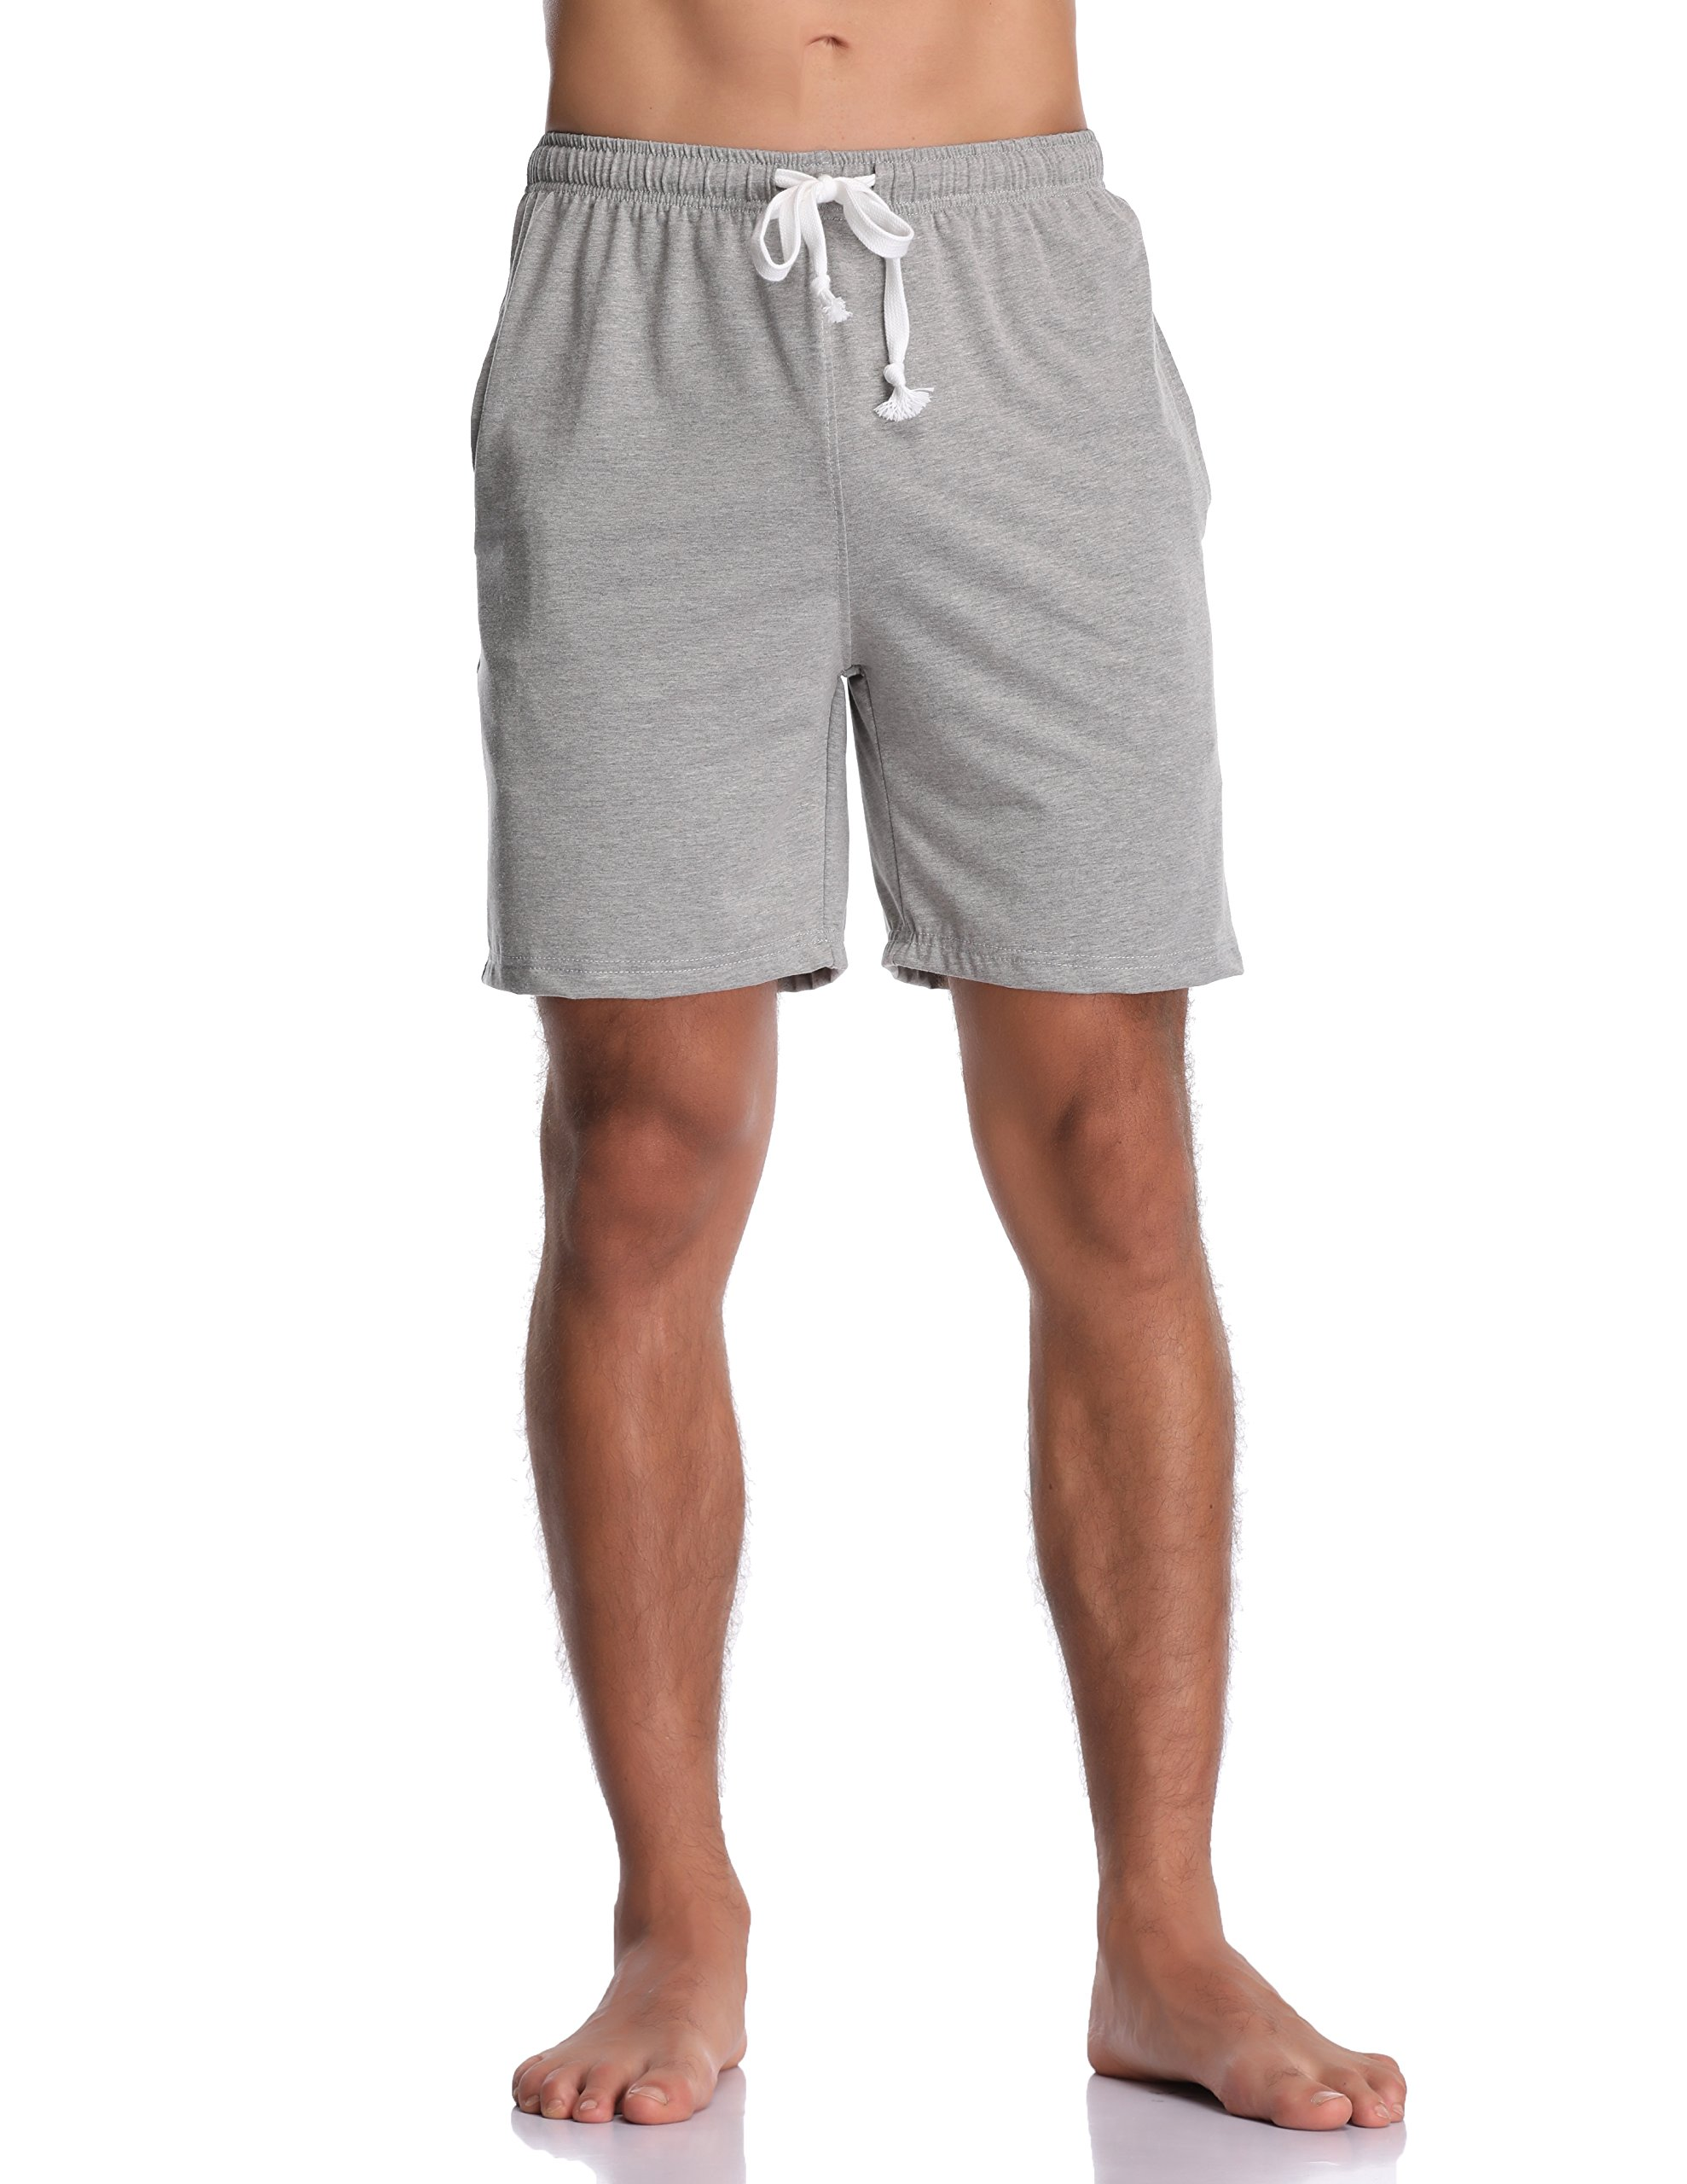 Luvrobes Men's Cotton Knit Pajama Lounge Shorts Sleep Bottoms (M, Heather Grey)